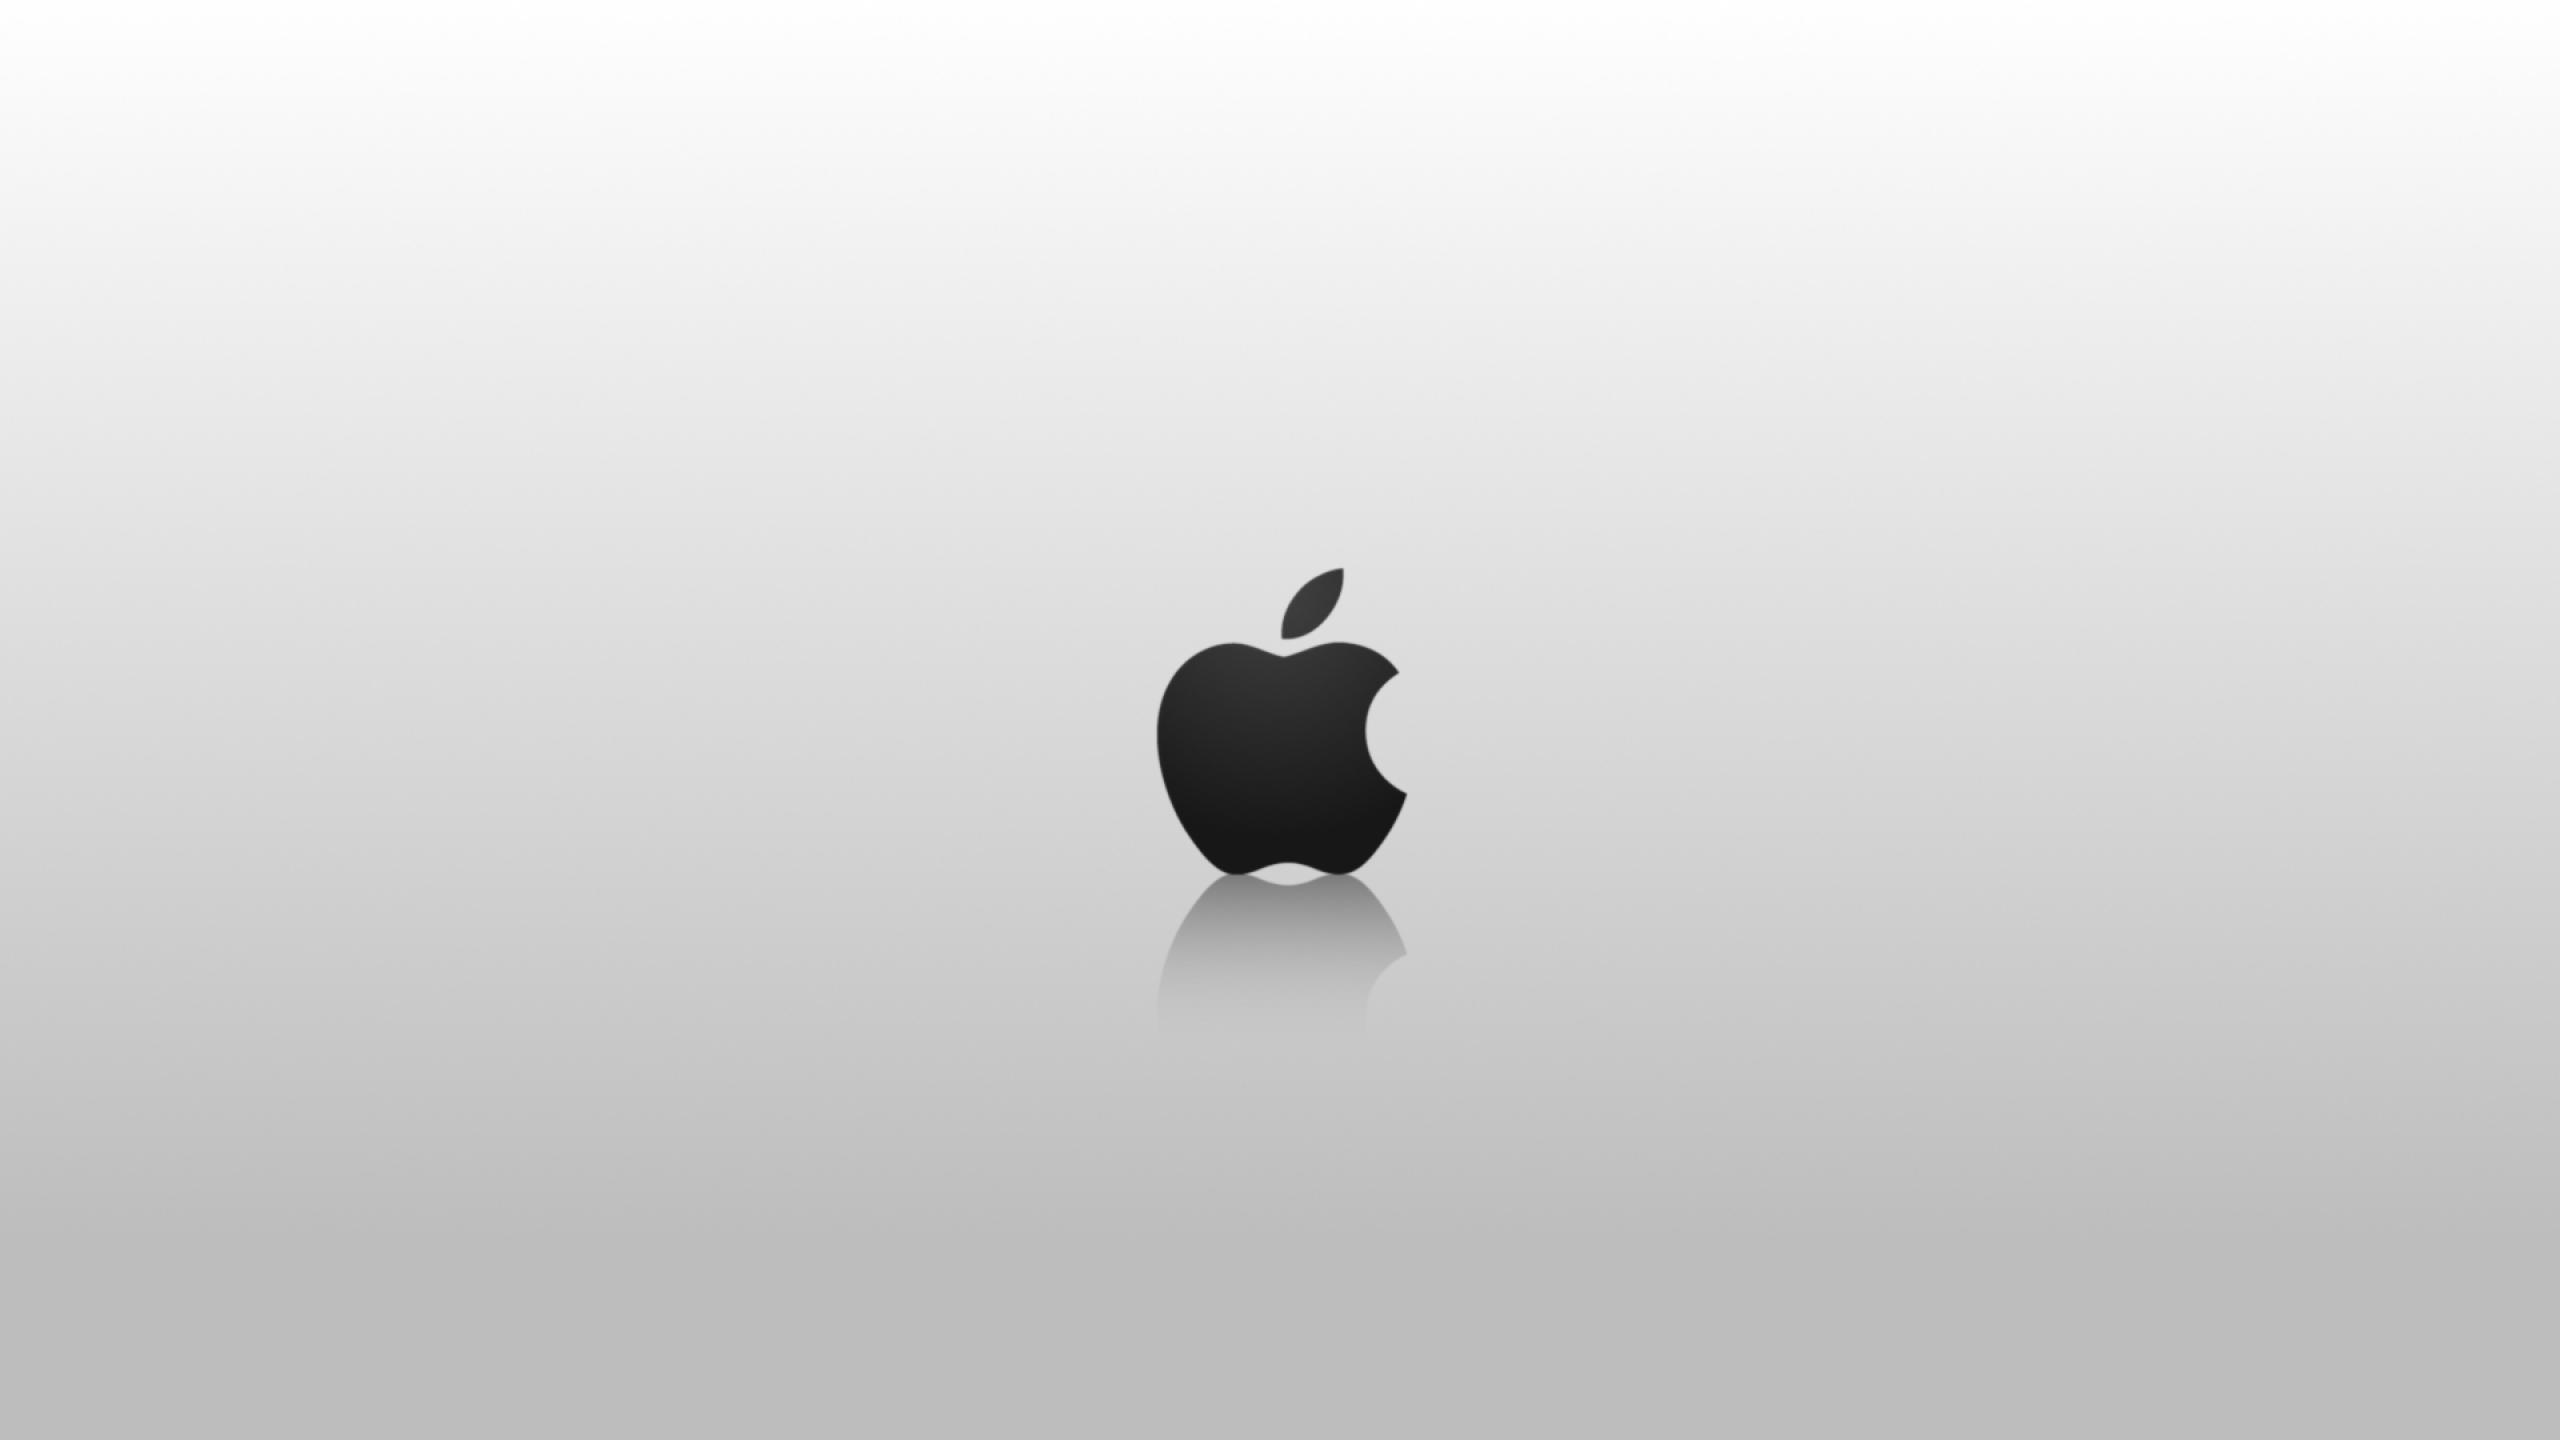 2560x1440 imac mac apples simple 1920x1080 wallpaper Wallpaper 2560x1440